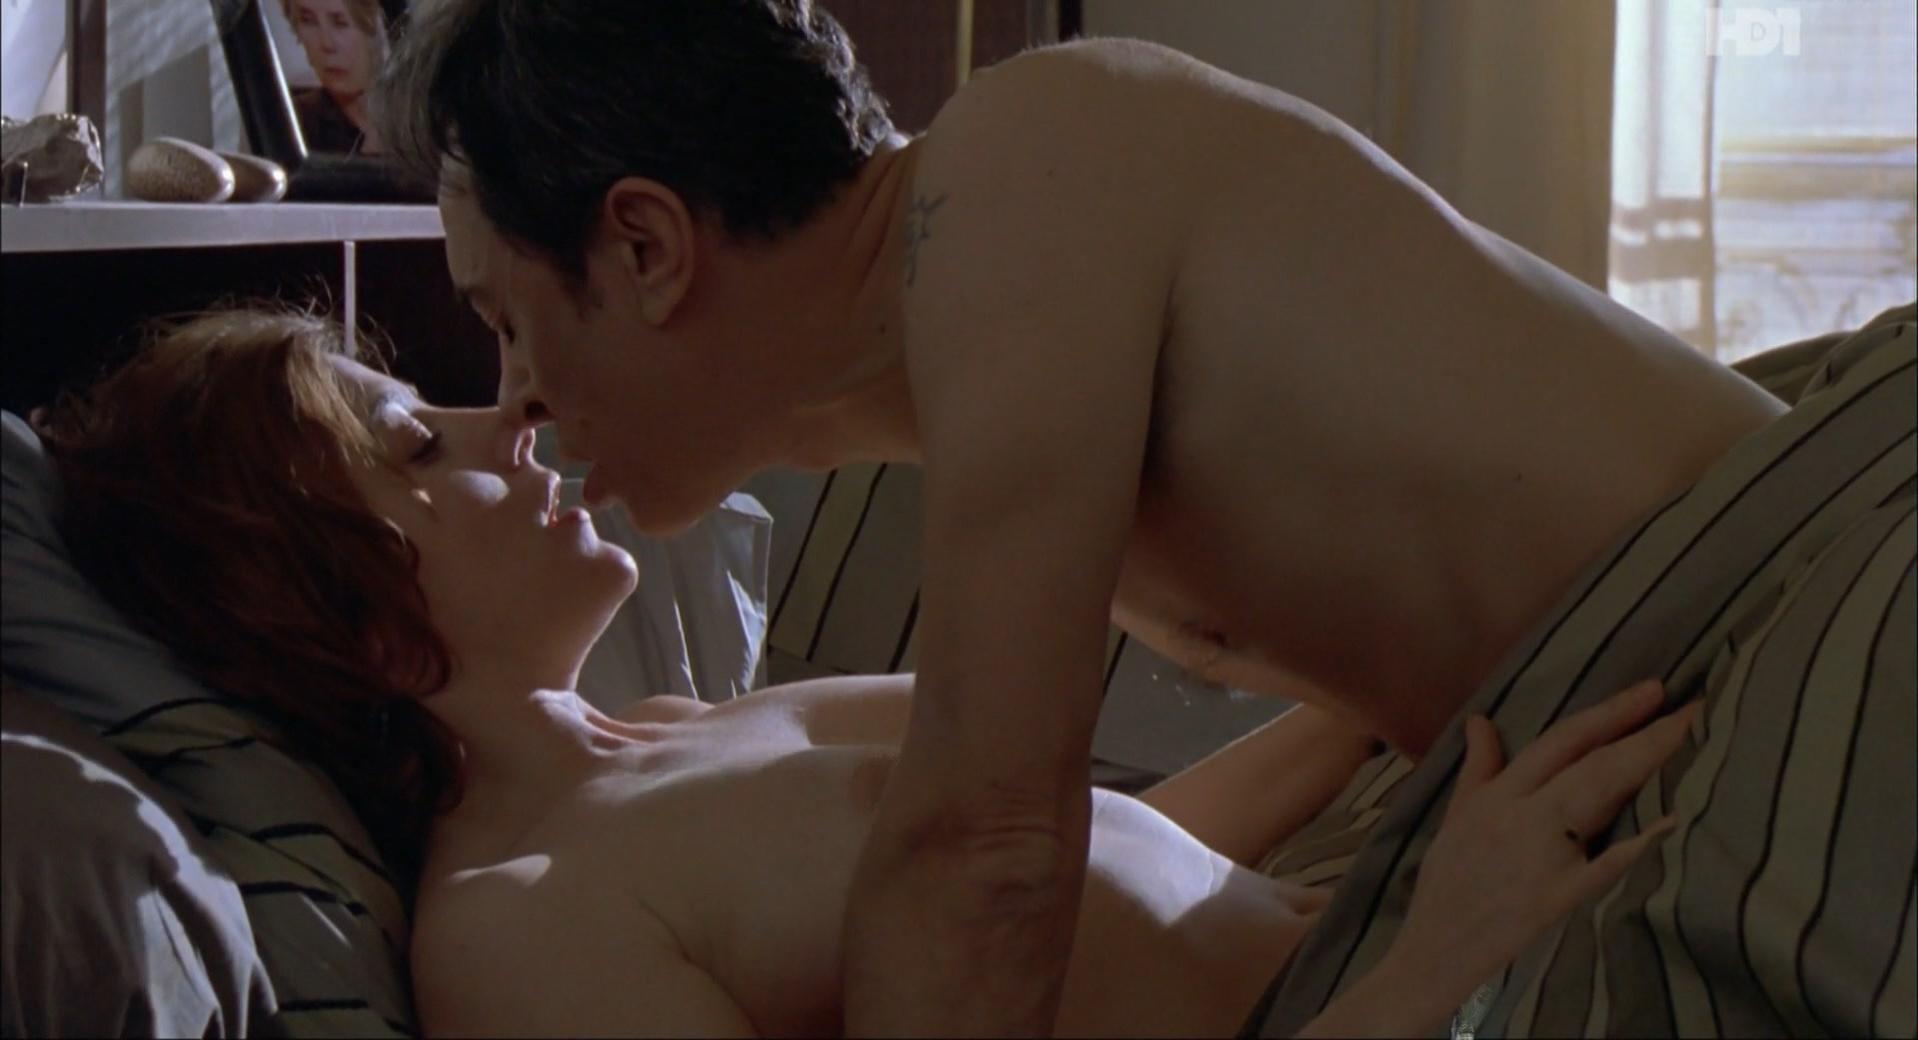 Valeria Bruni Tedeschi nude - Ah! Si j'étais riche (2002)